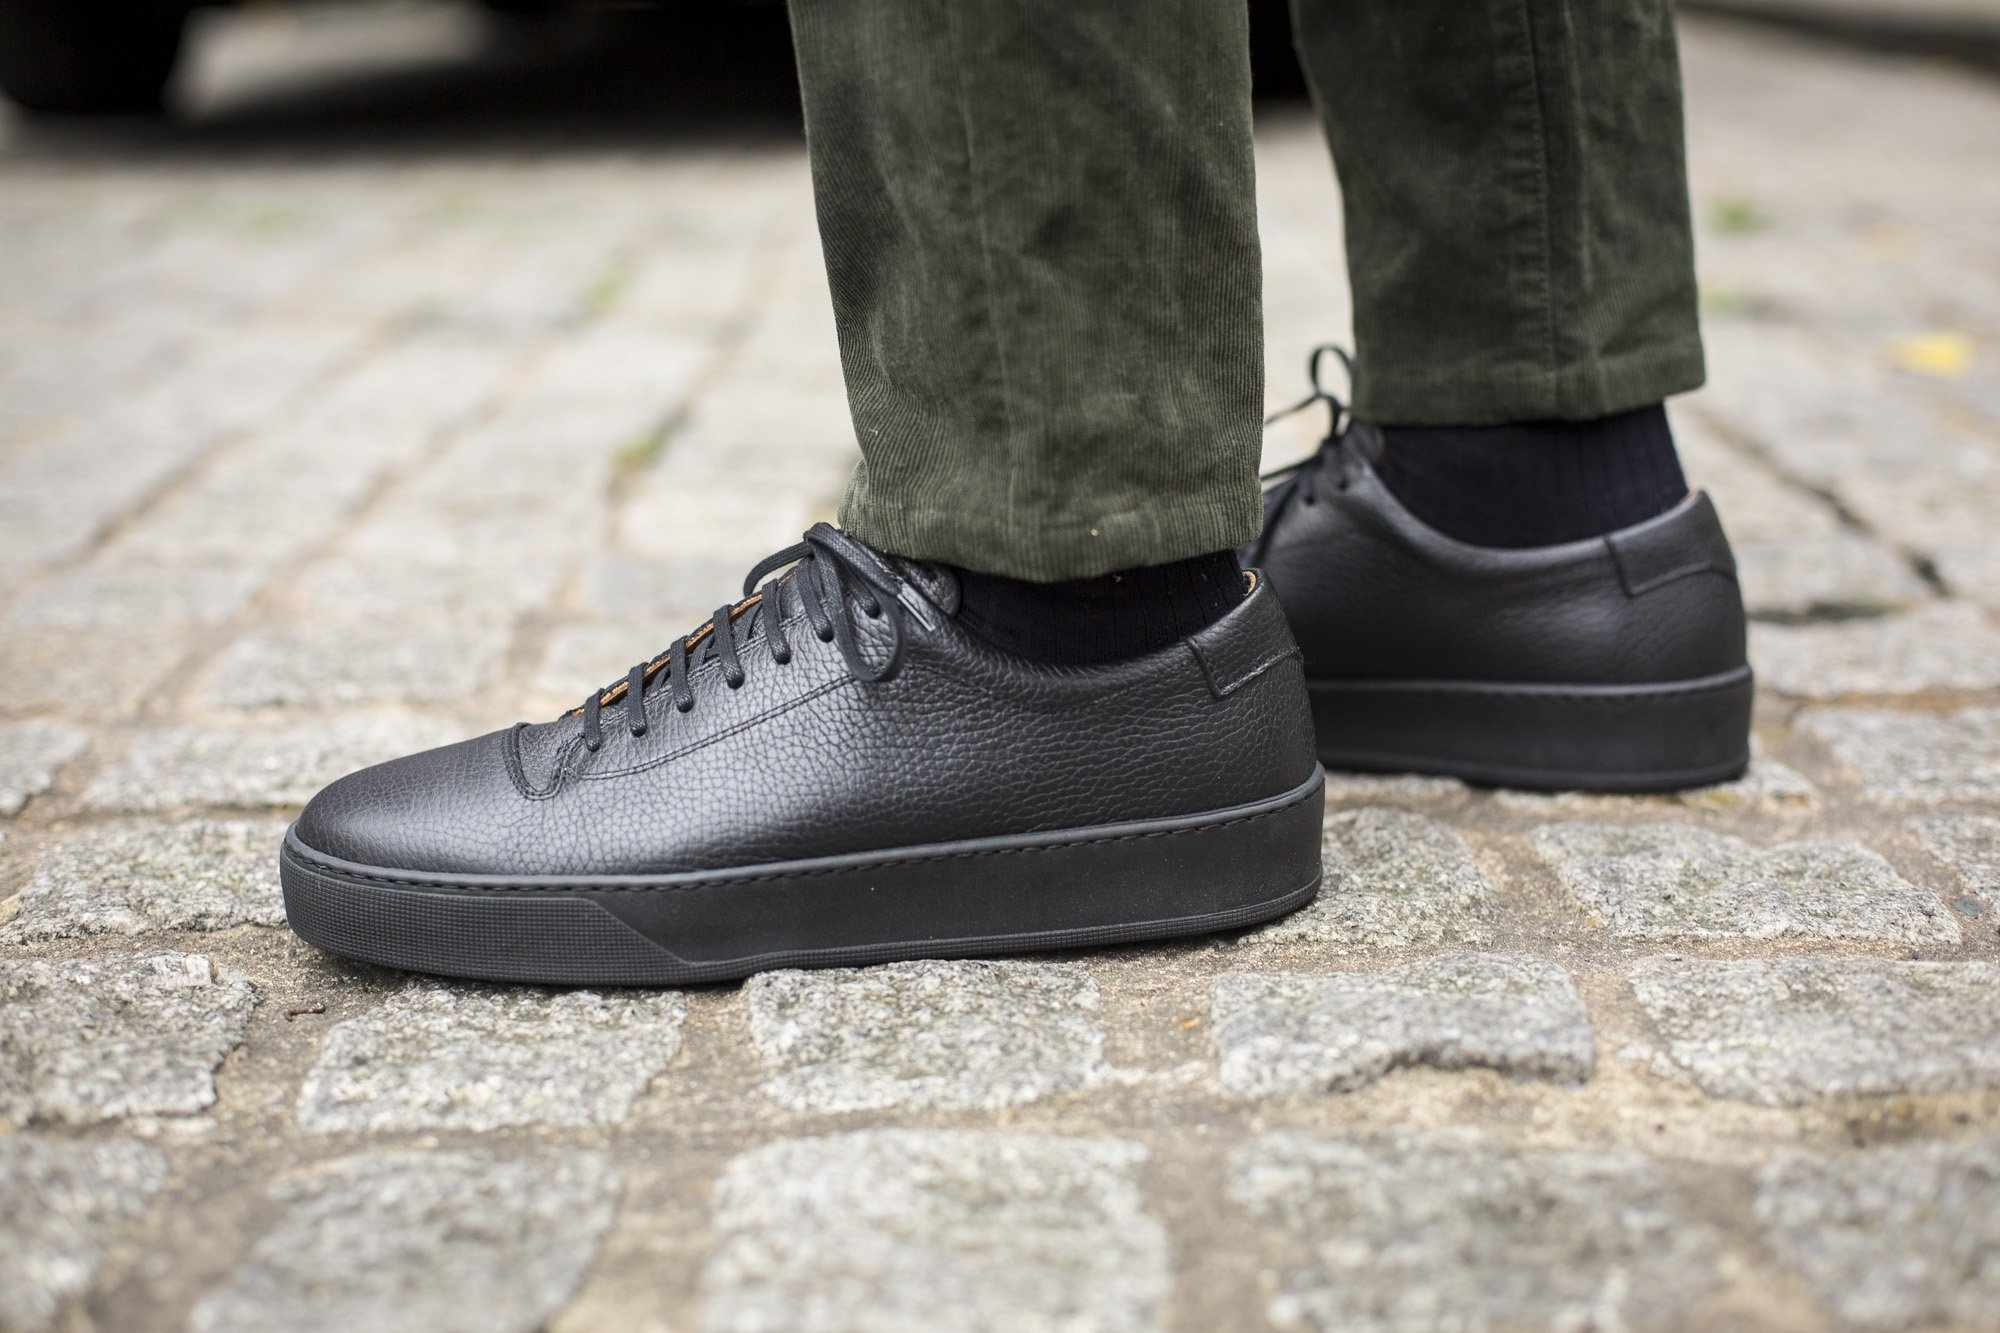 j-fitzpatrick-footwear-collection-9-november-2017-hero-trainers-on-feet-0361_1024x1024@2x.jpg